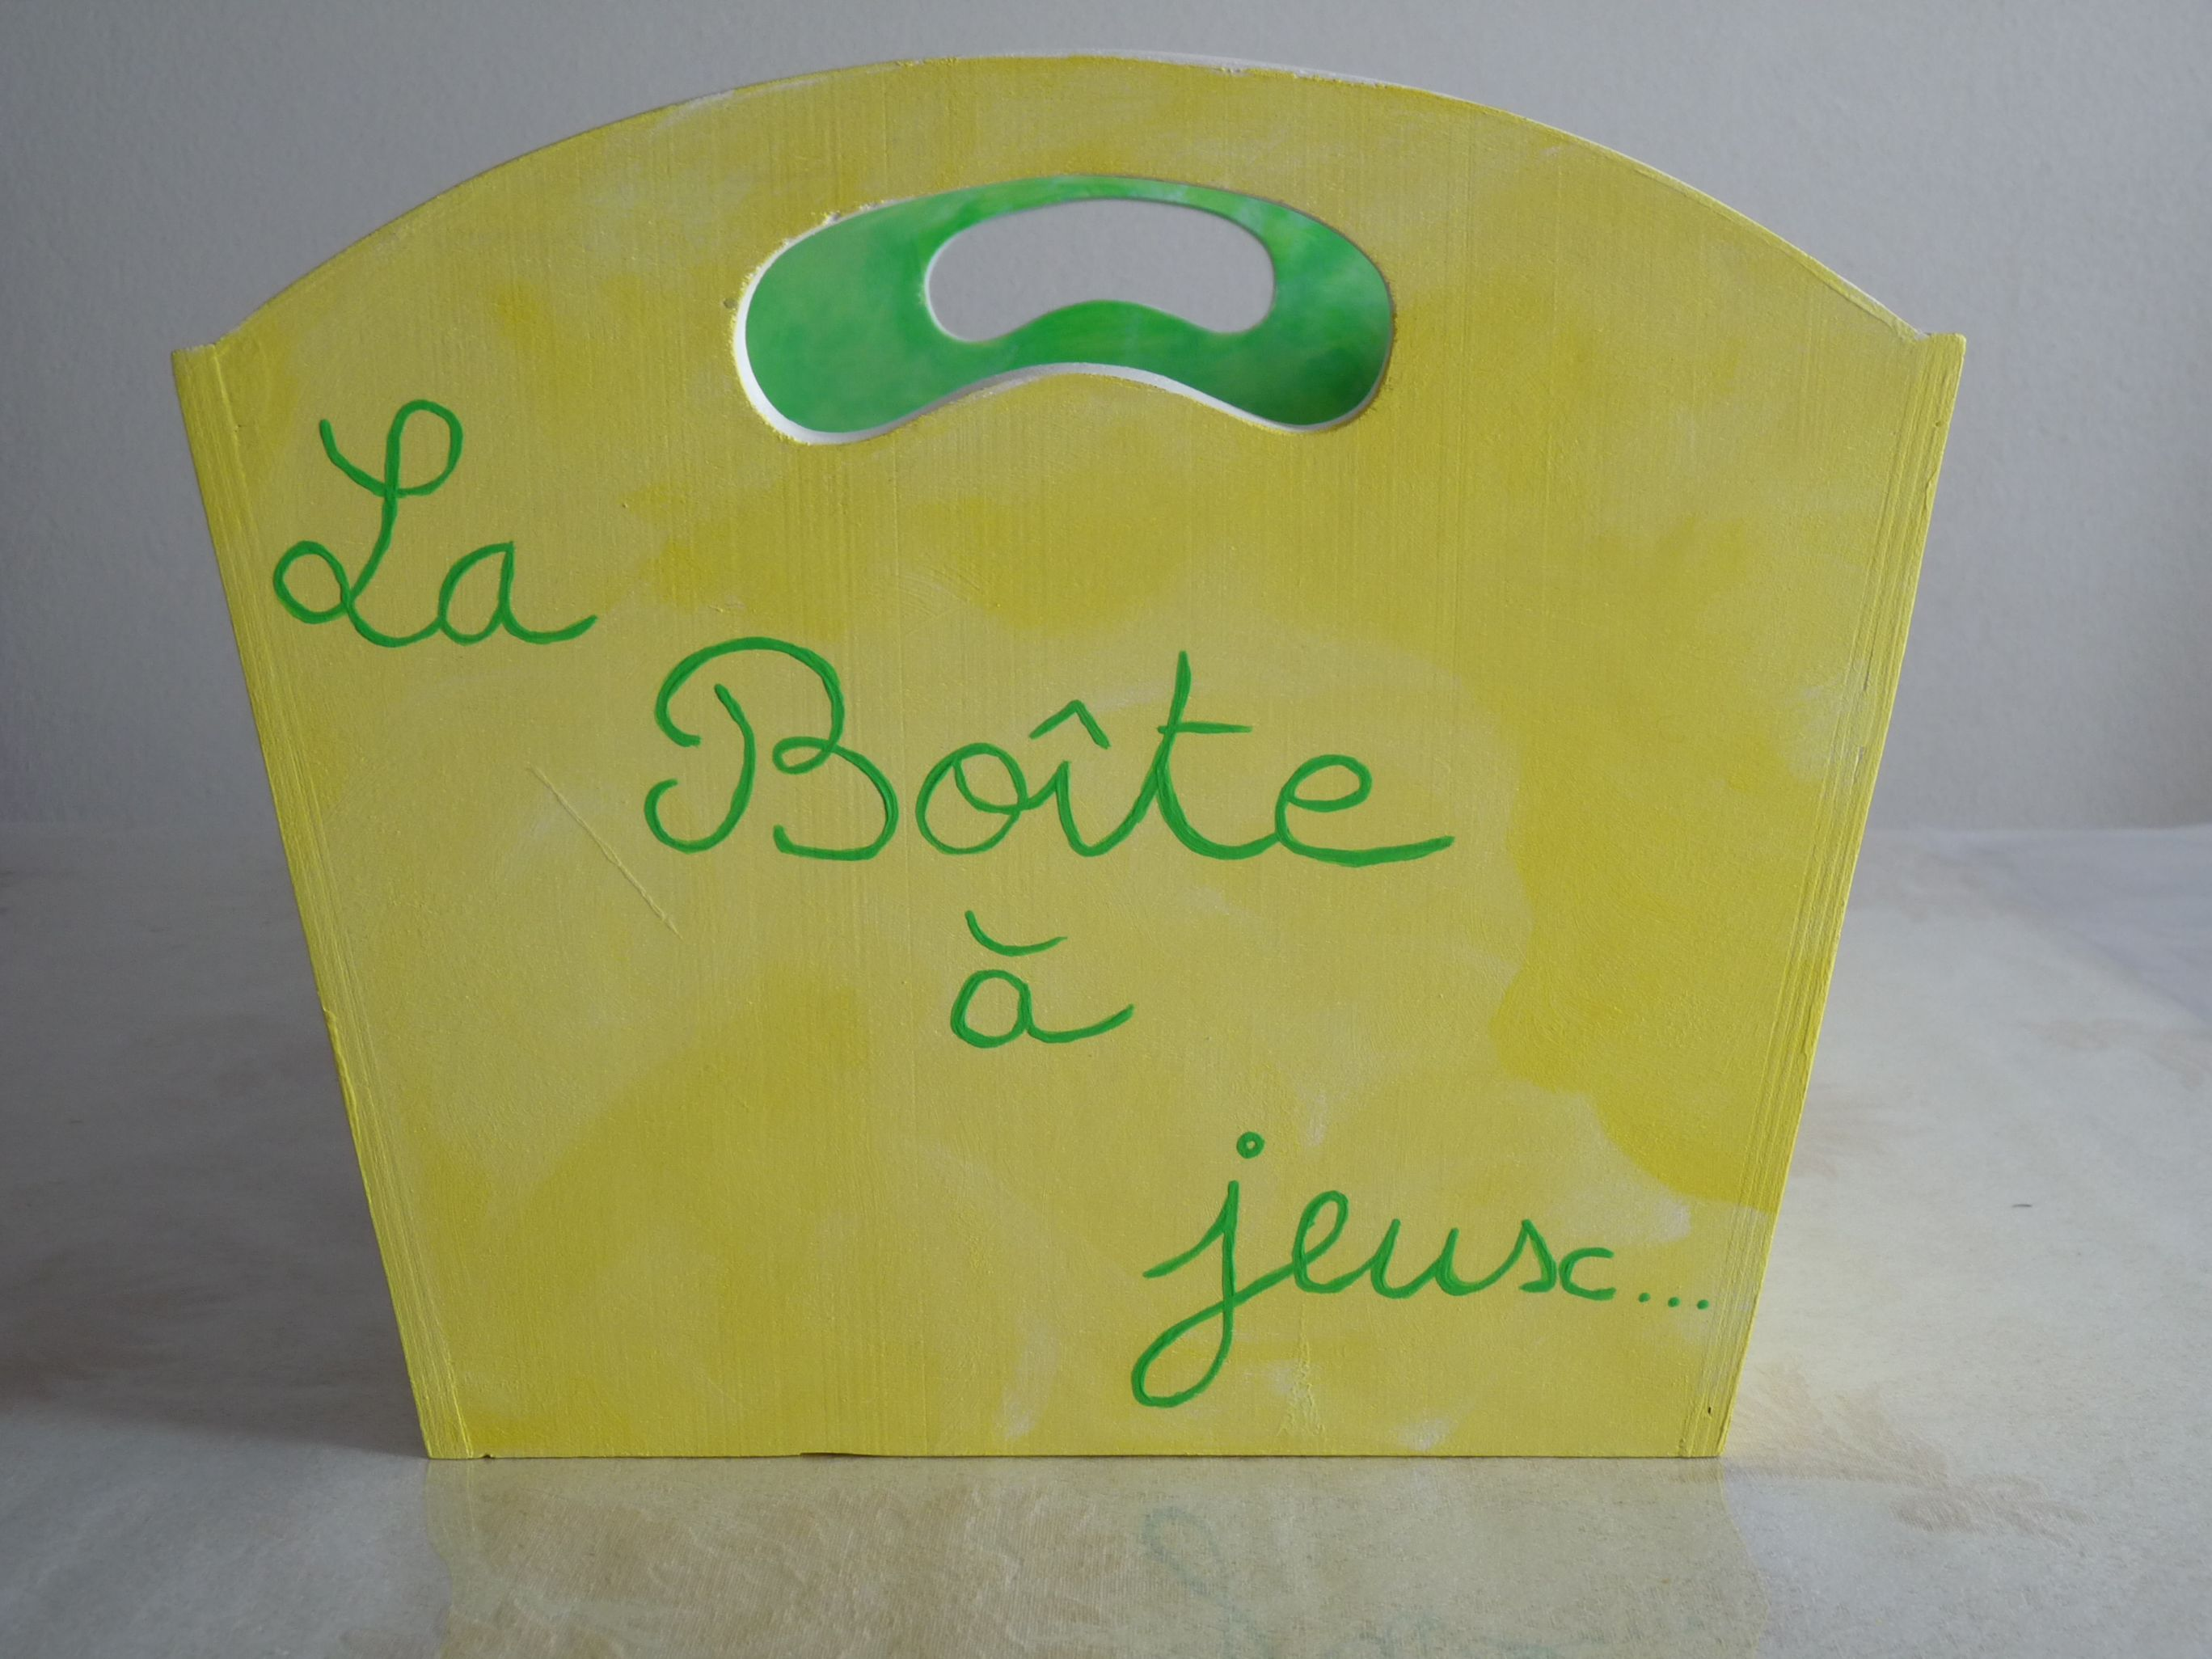 Bo te jeux for Boite a jeux